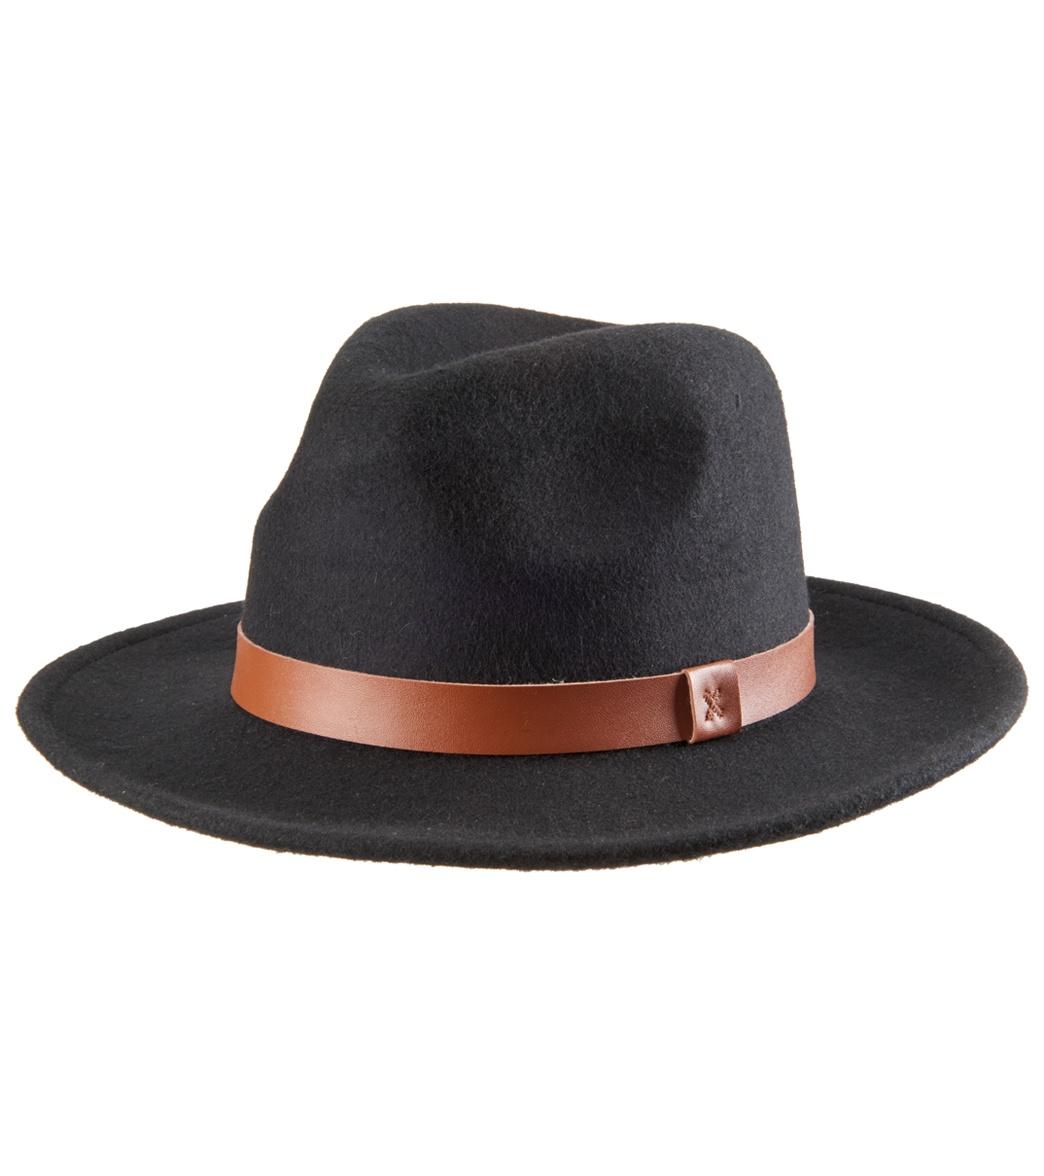 6156a6680fc66 Rhythm Men s Everyday Fedora Hat at SwimOutlet.com